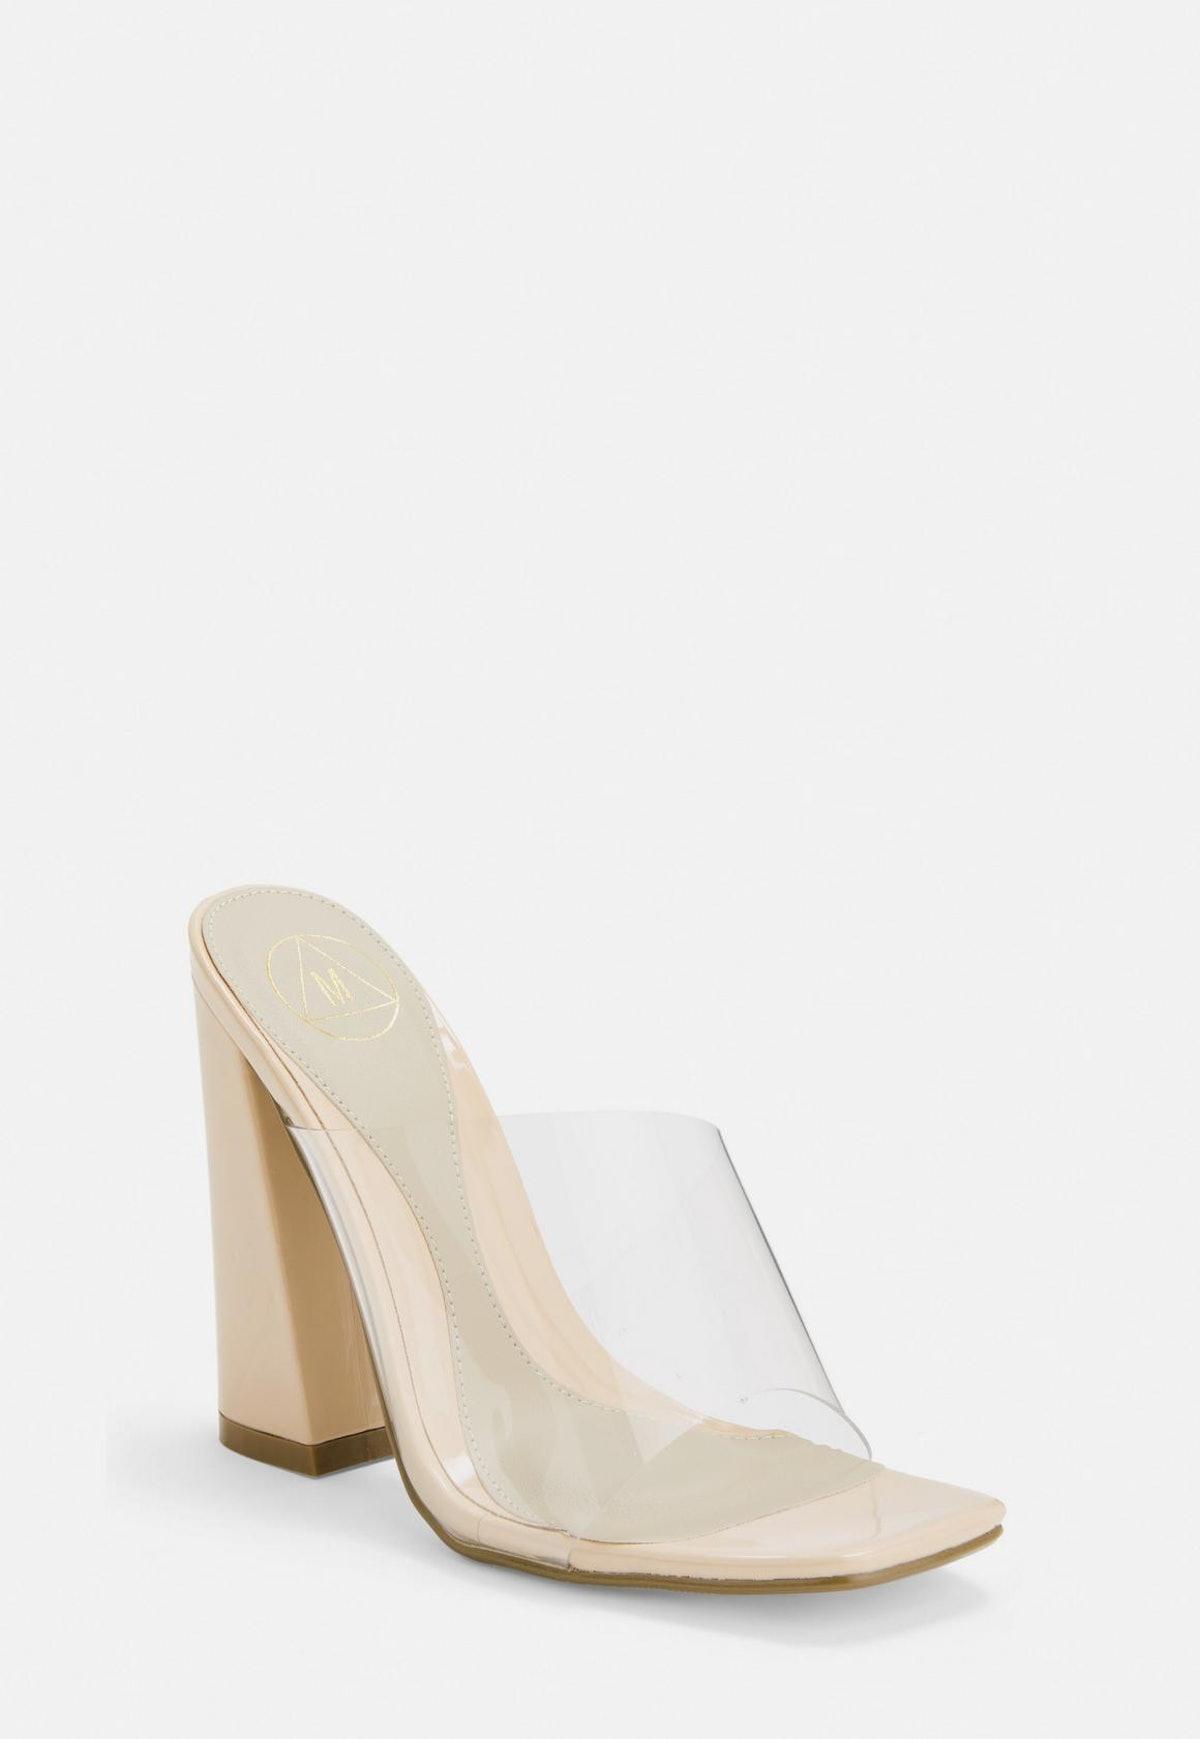 Nude Asymmetric Clear Flared Heel Mules